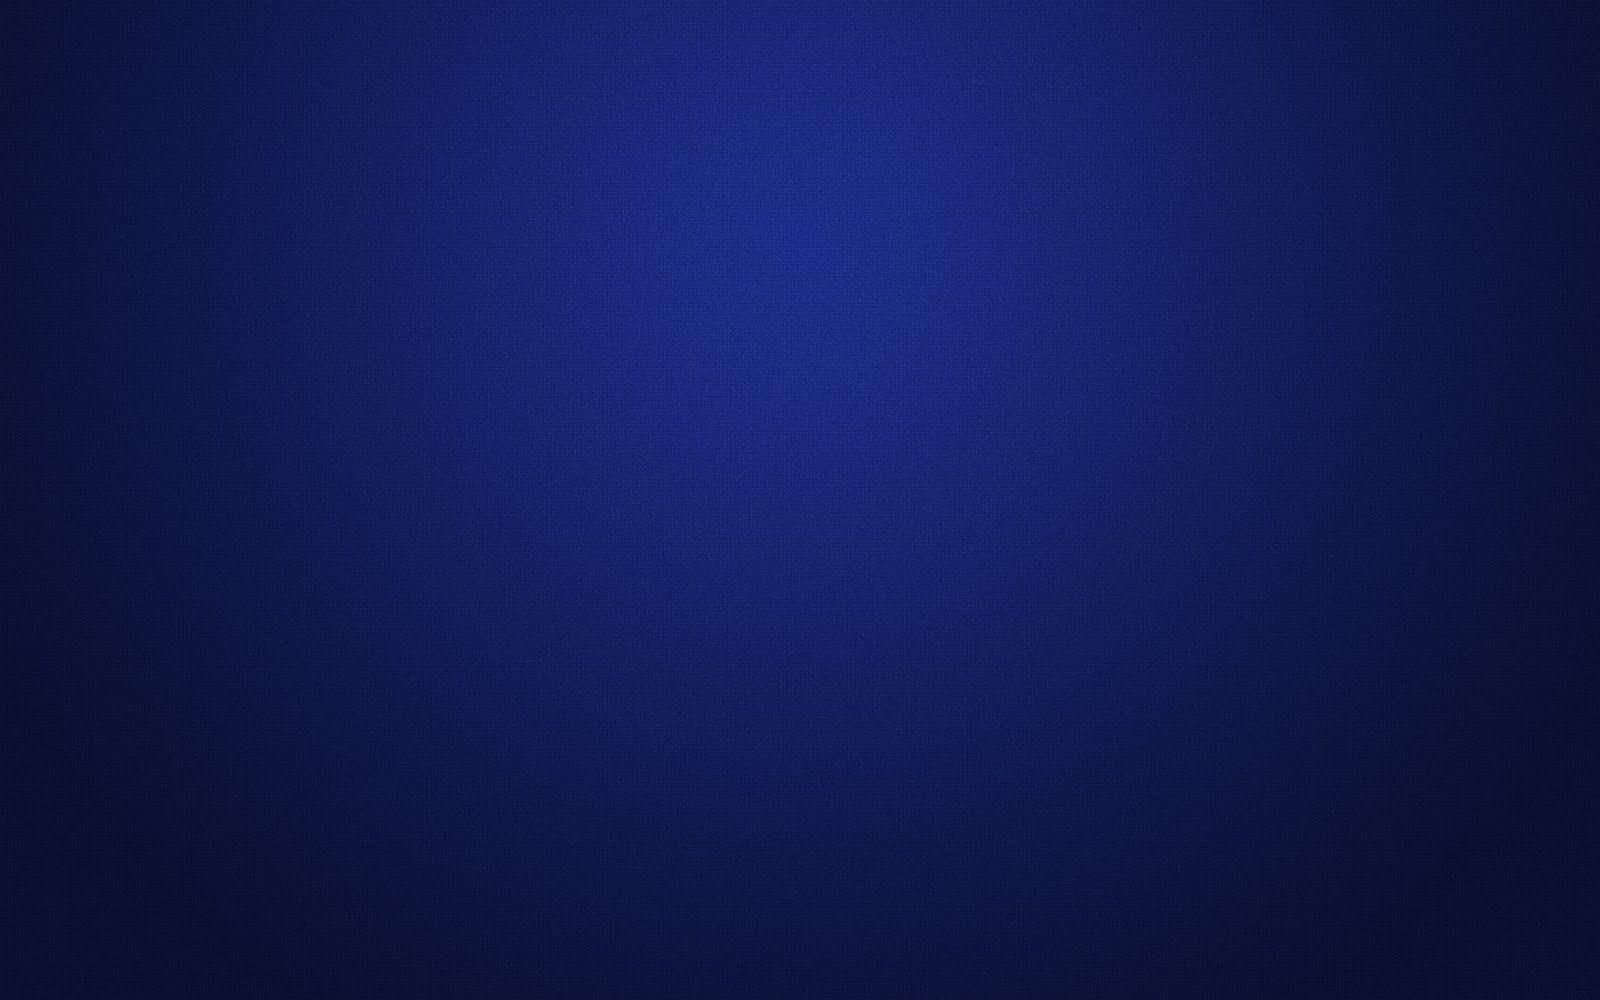 Blue Wallpaper Backgrounds